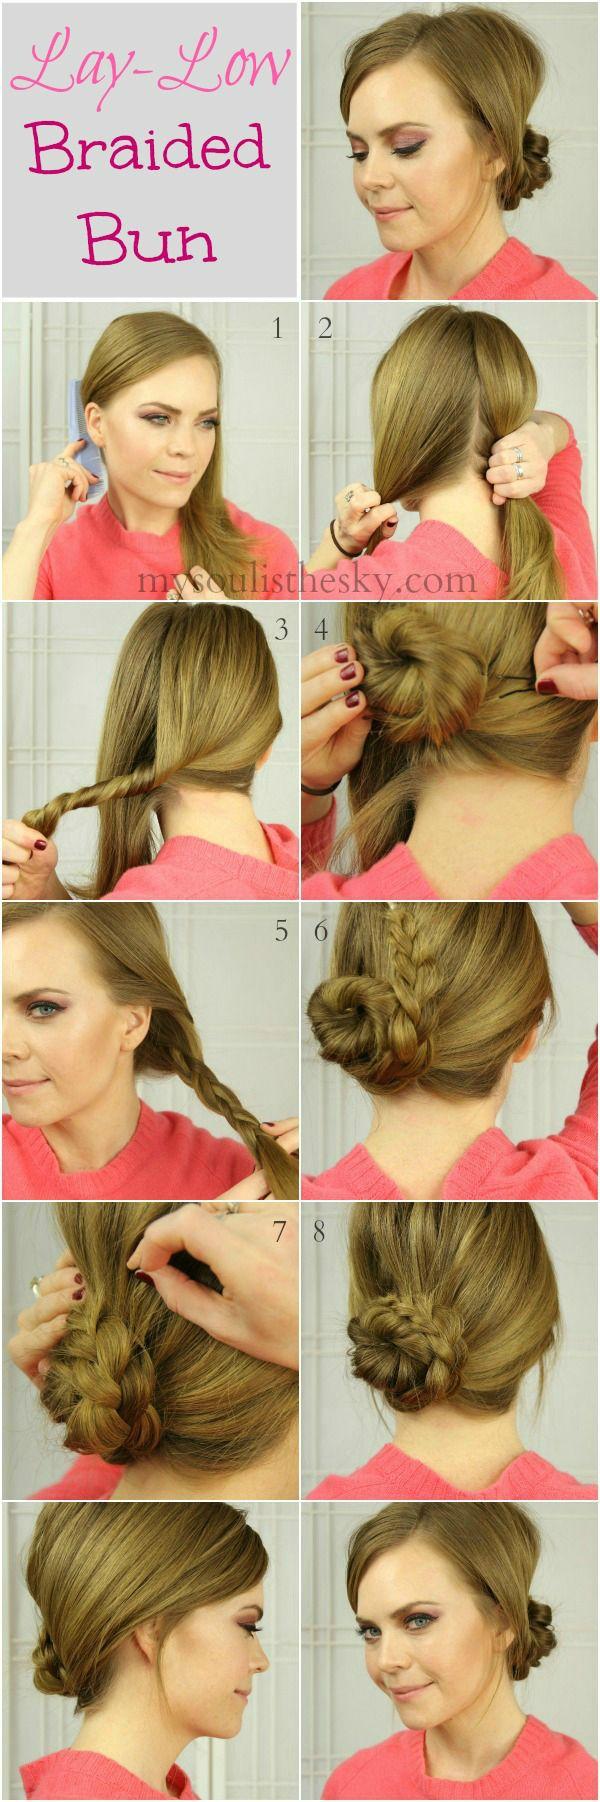 lay-low braided bun   MissySue.com